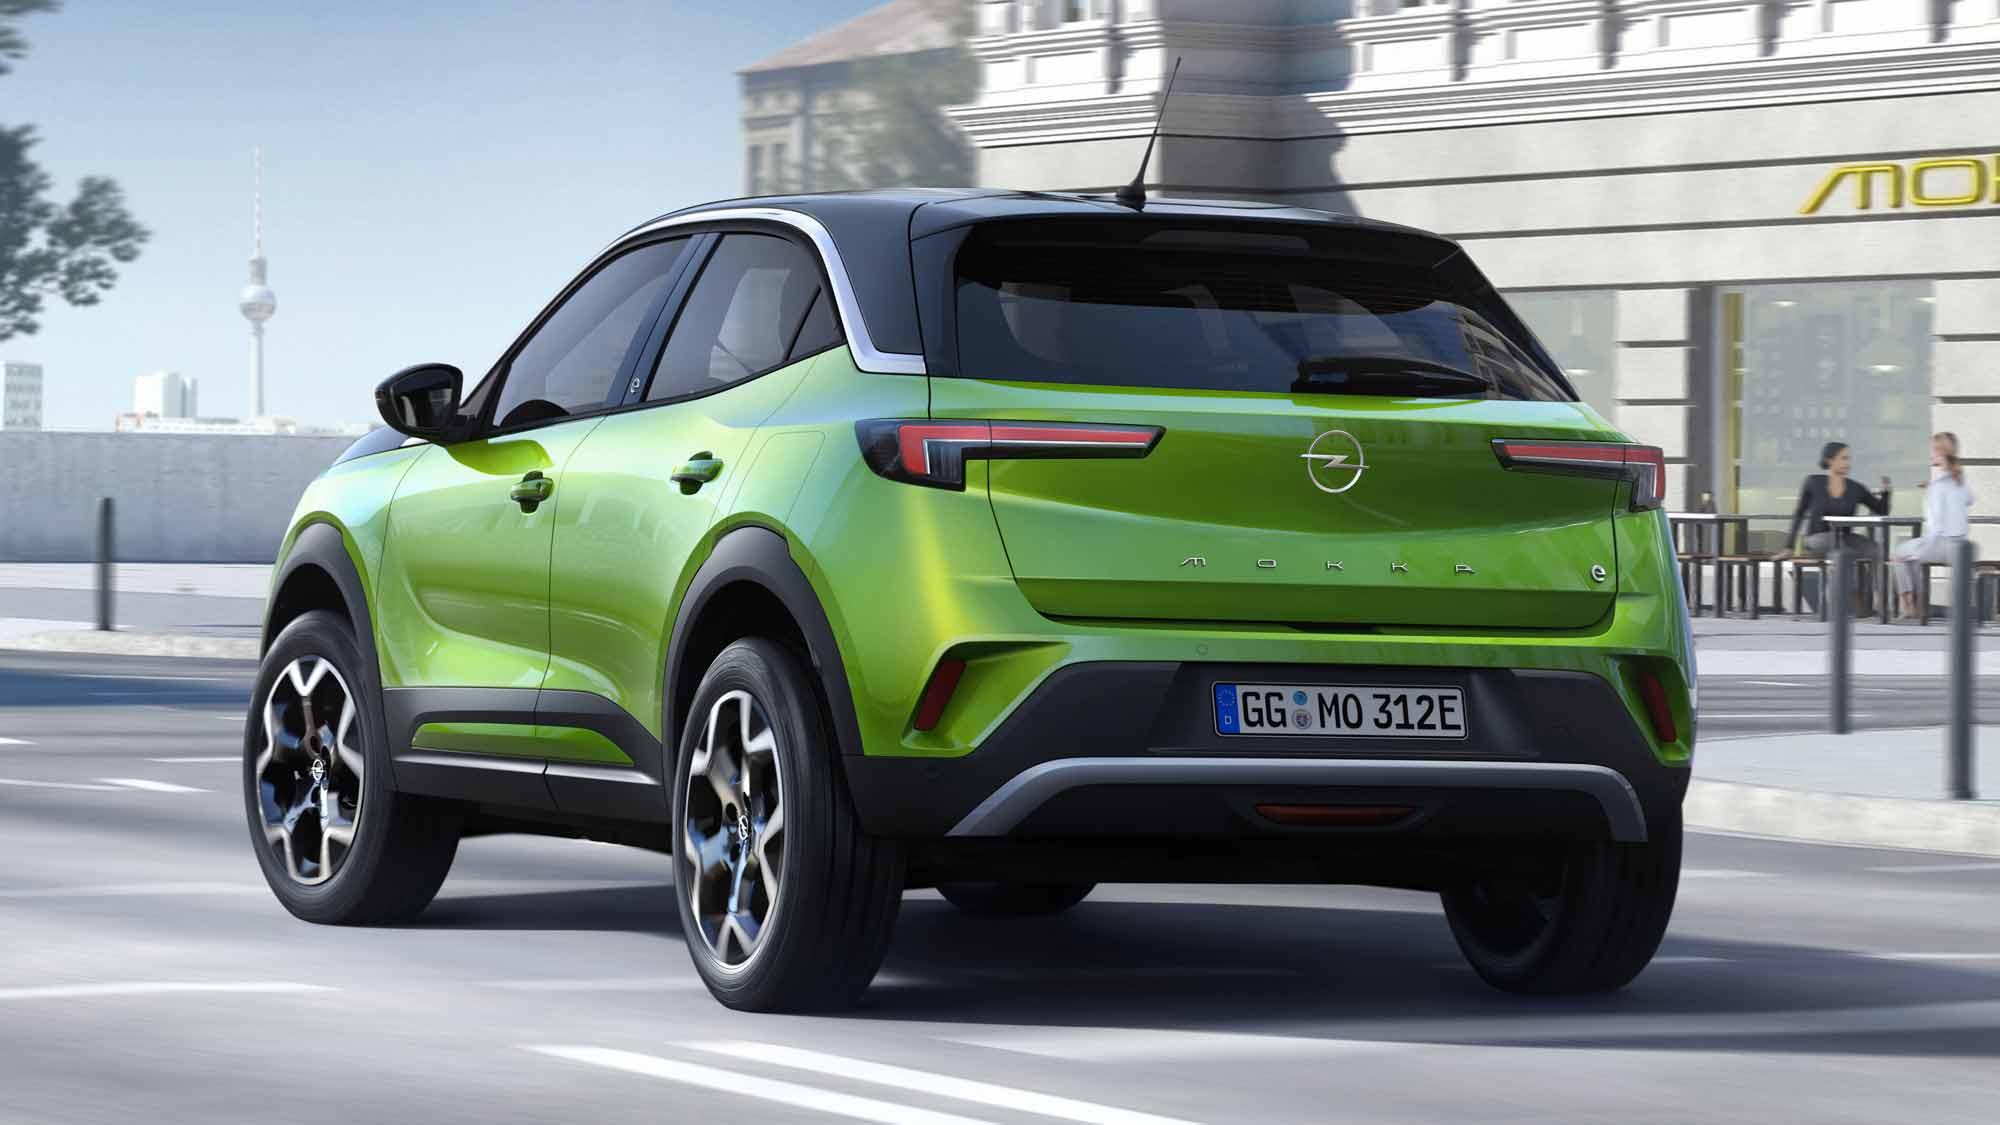 Retro Opel Mokka